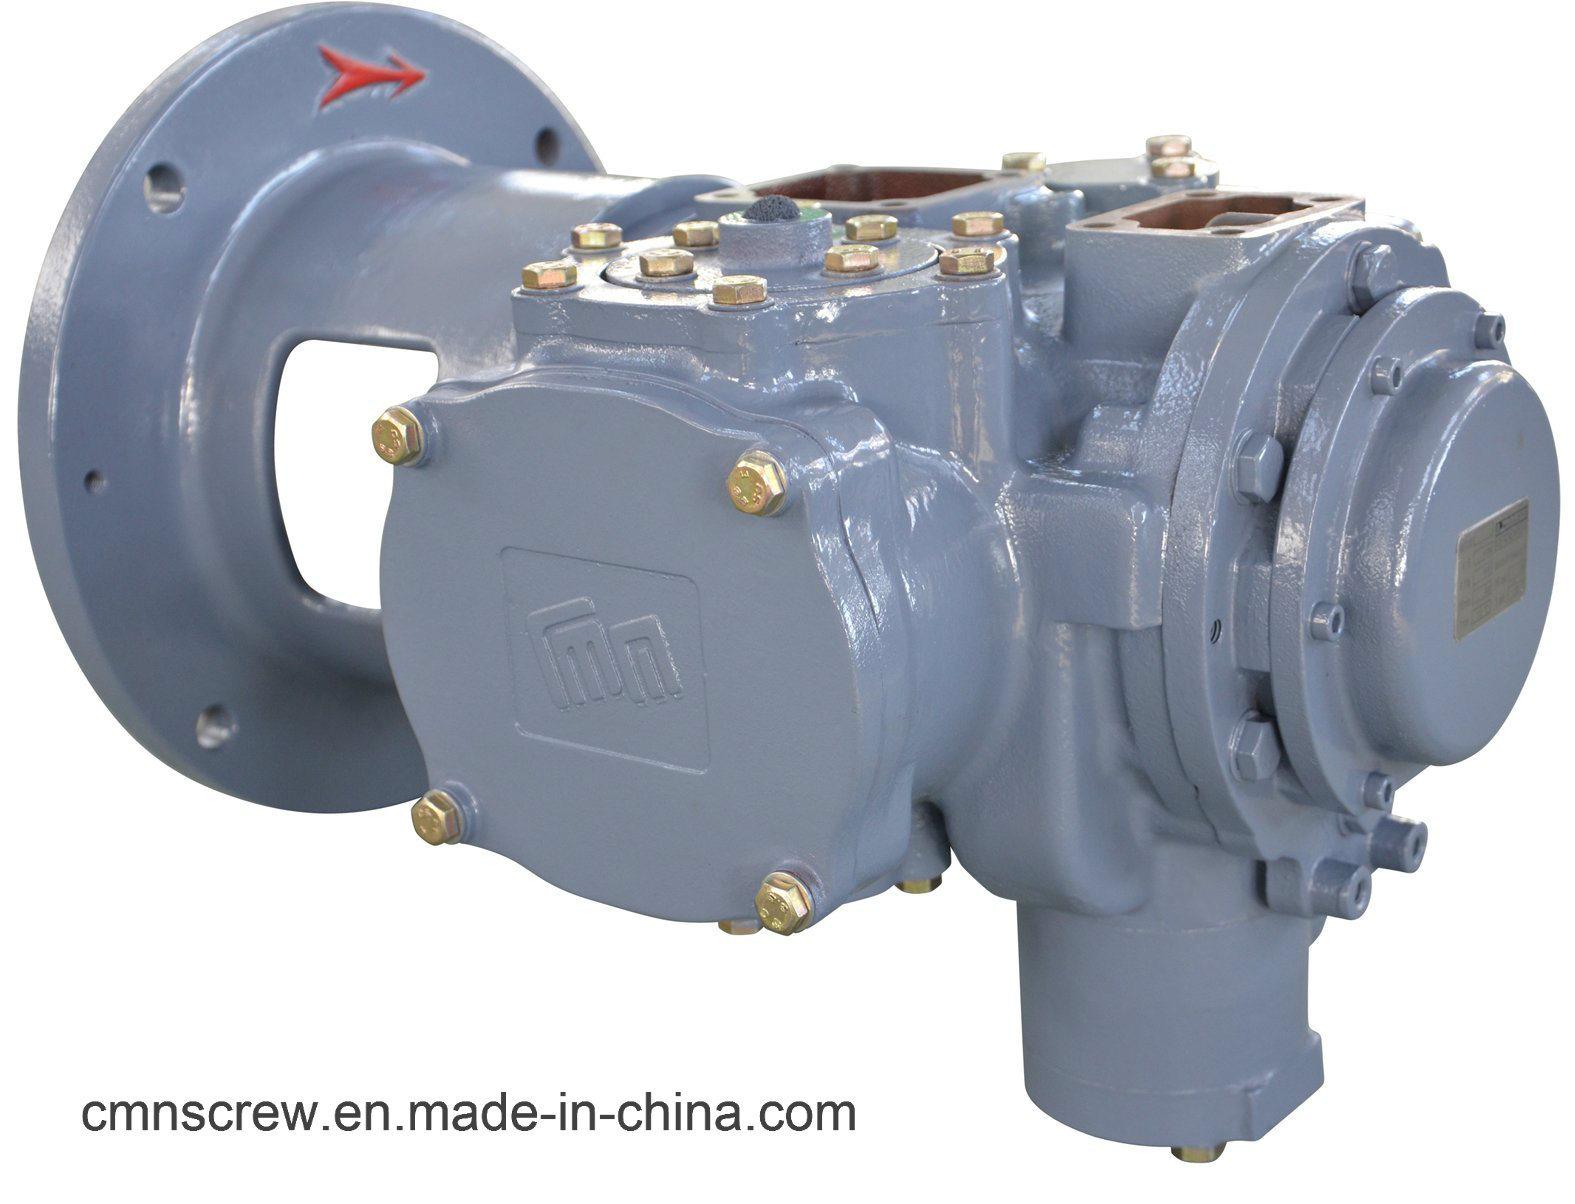 Micro Oil Screw Air Compressor (CMN37A)